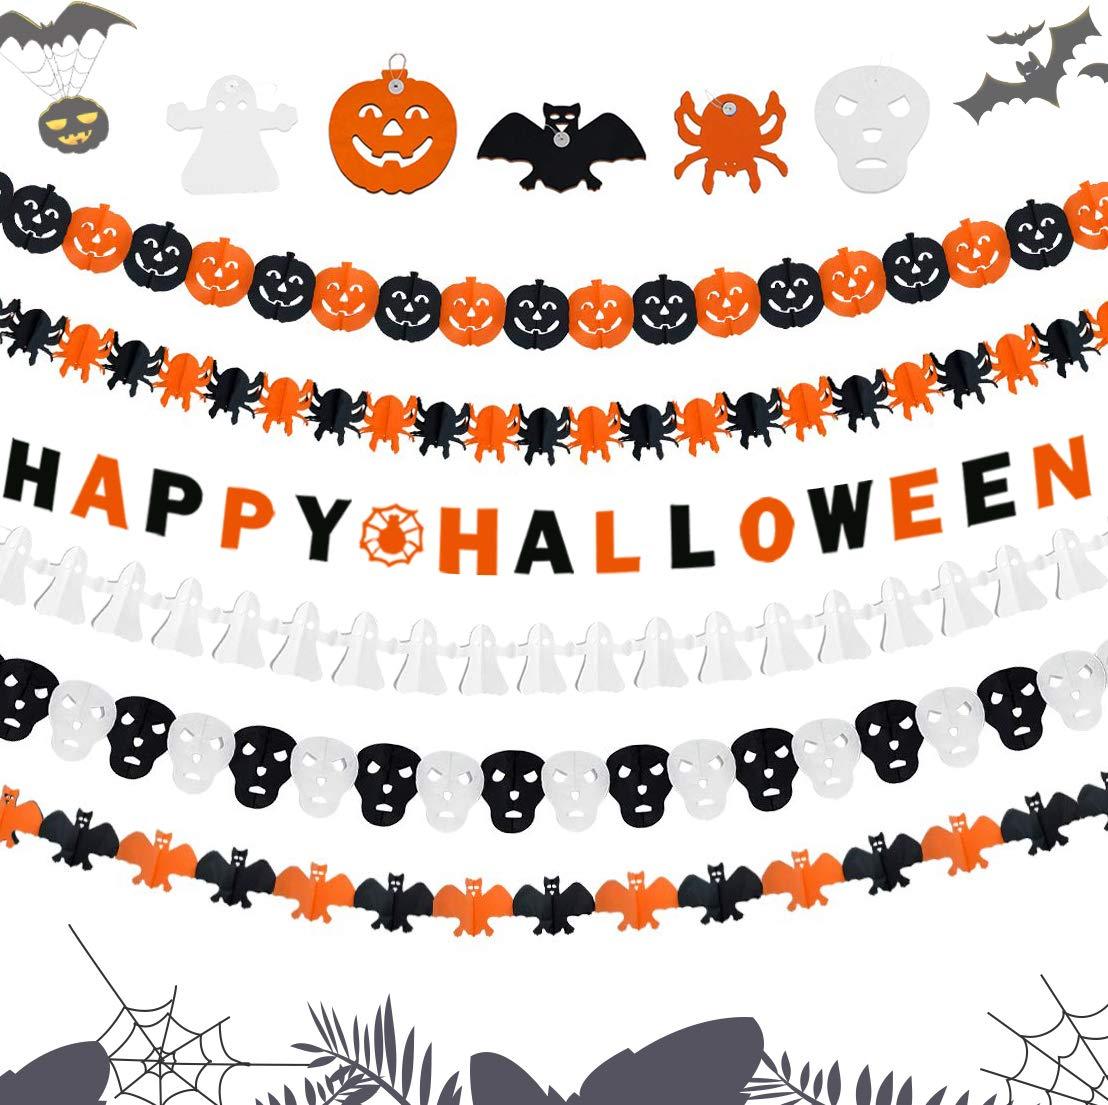 Halloween Halloween Decoration Happy Halloween Banner Halloween Party Halloween Banner Halloween Decor Scary Halloween